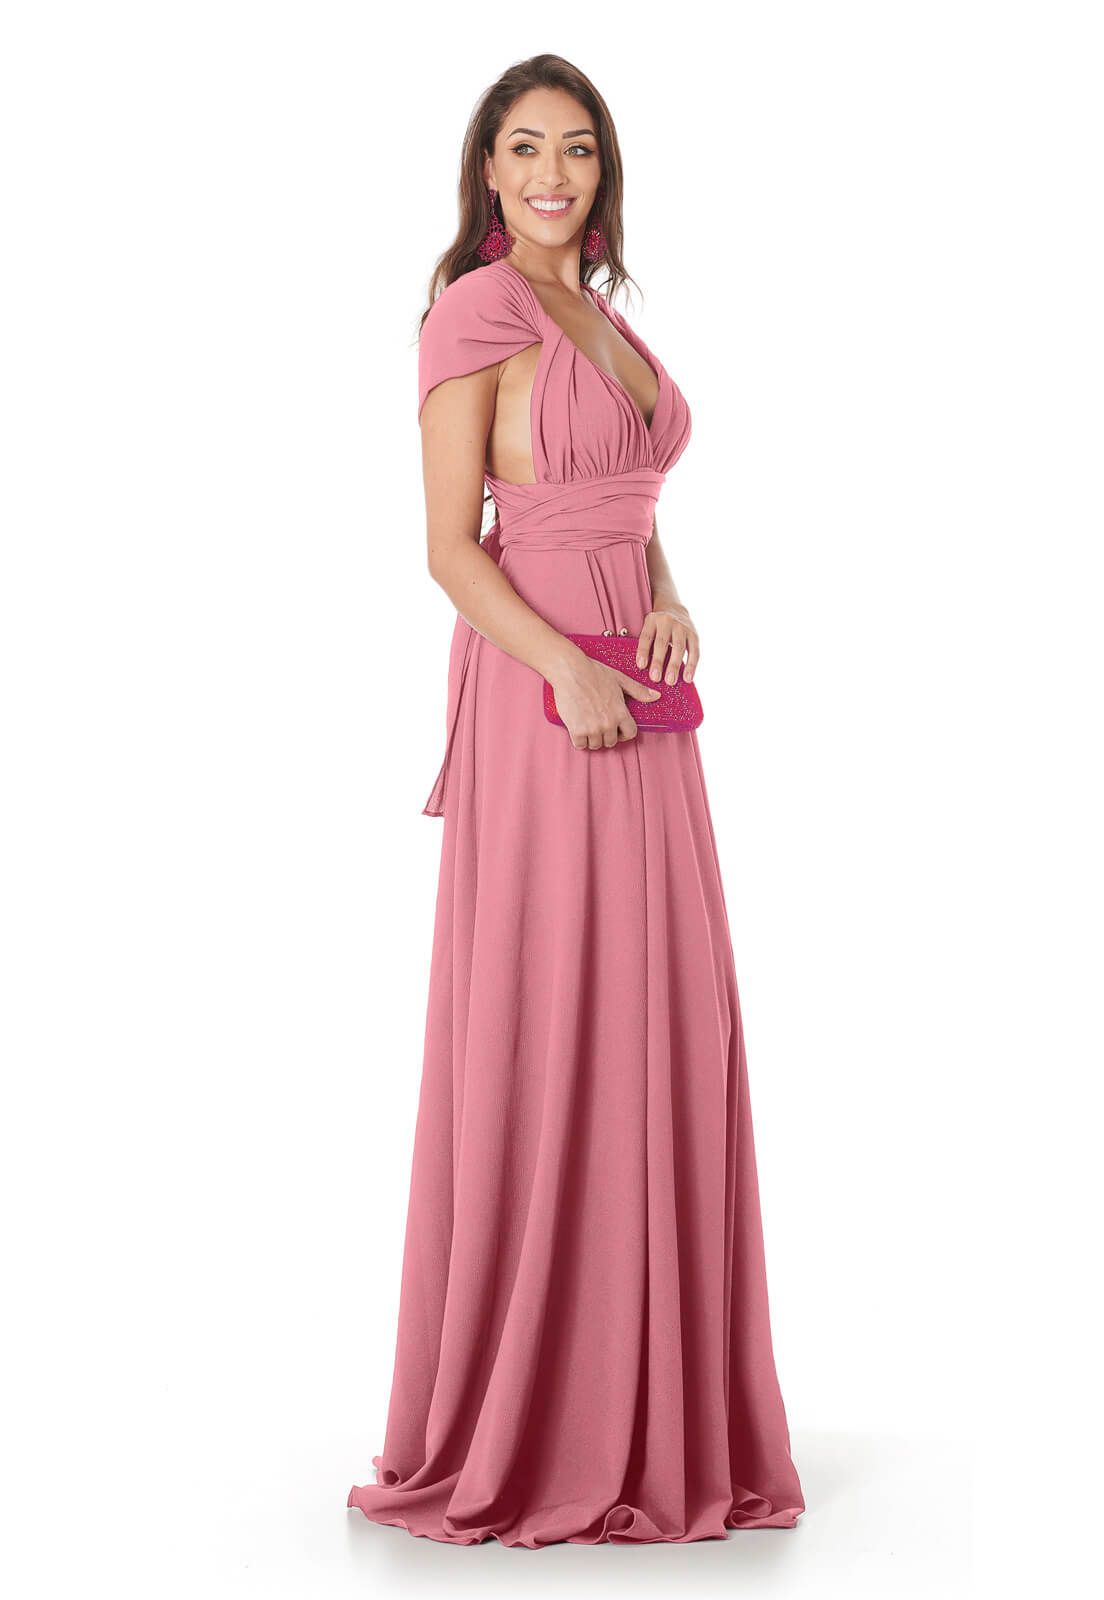 Vestido Longo Mil Formas Rosa Velho Lala Dubi